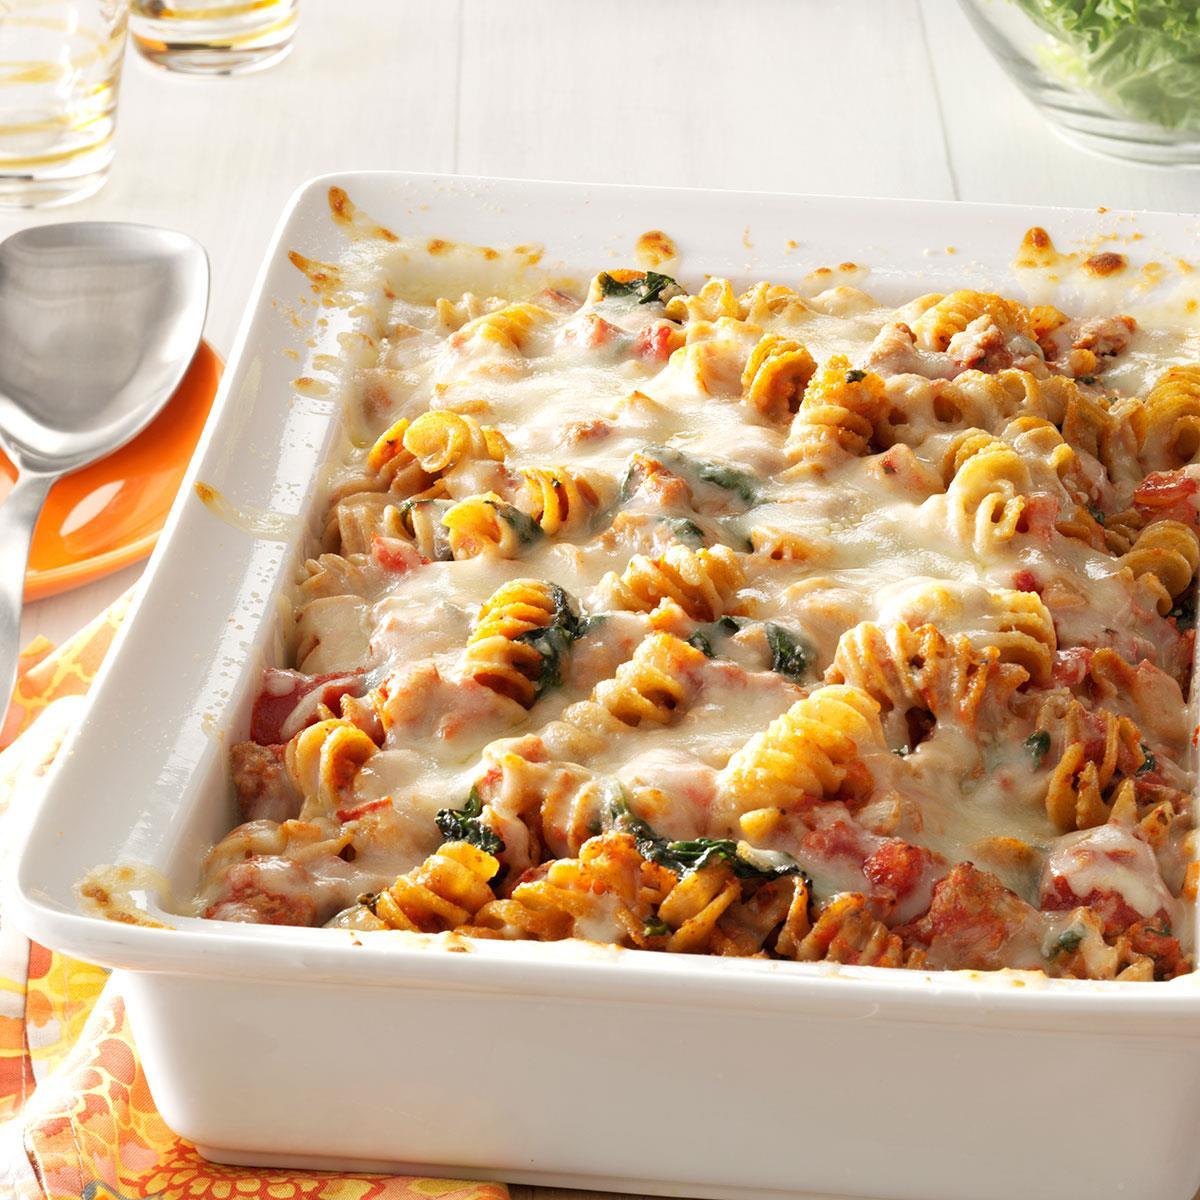 Sausage spinach pasta bake recipe taste of home for Creamy spinach pasta bake